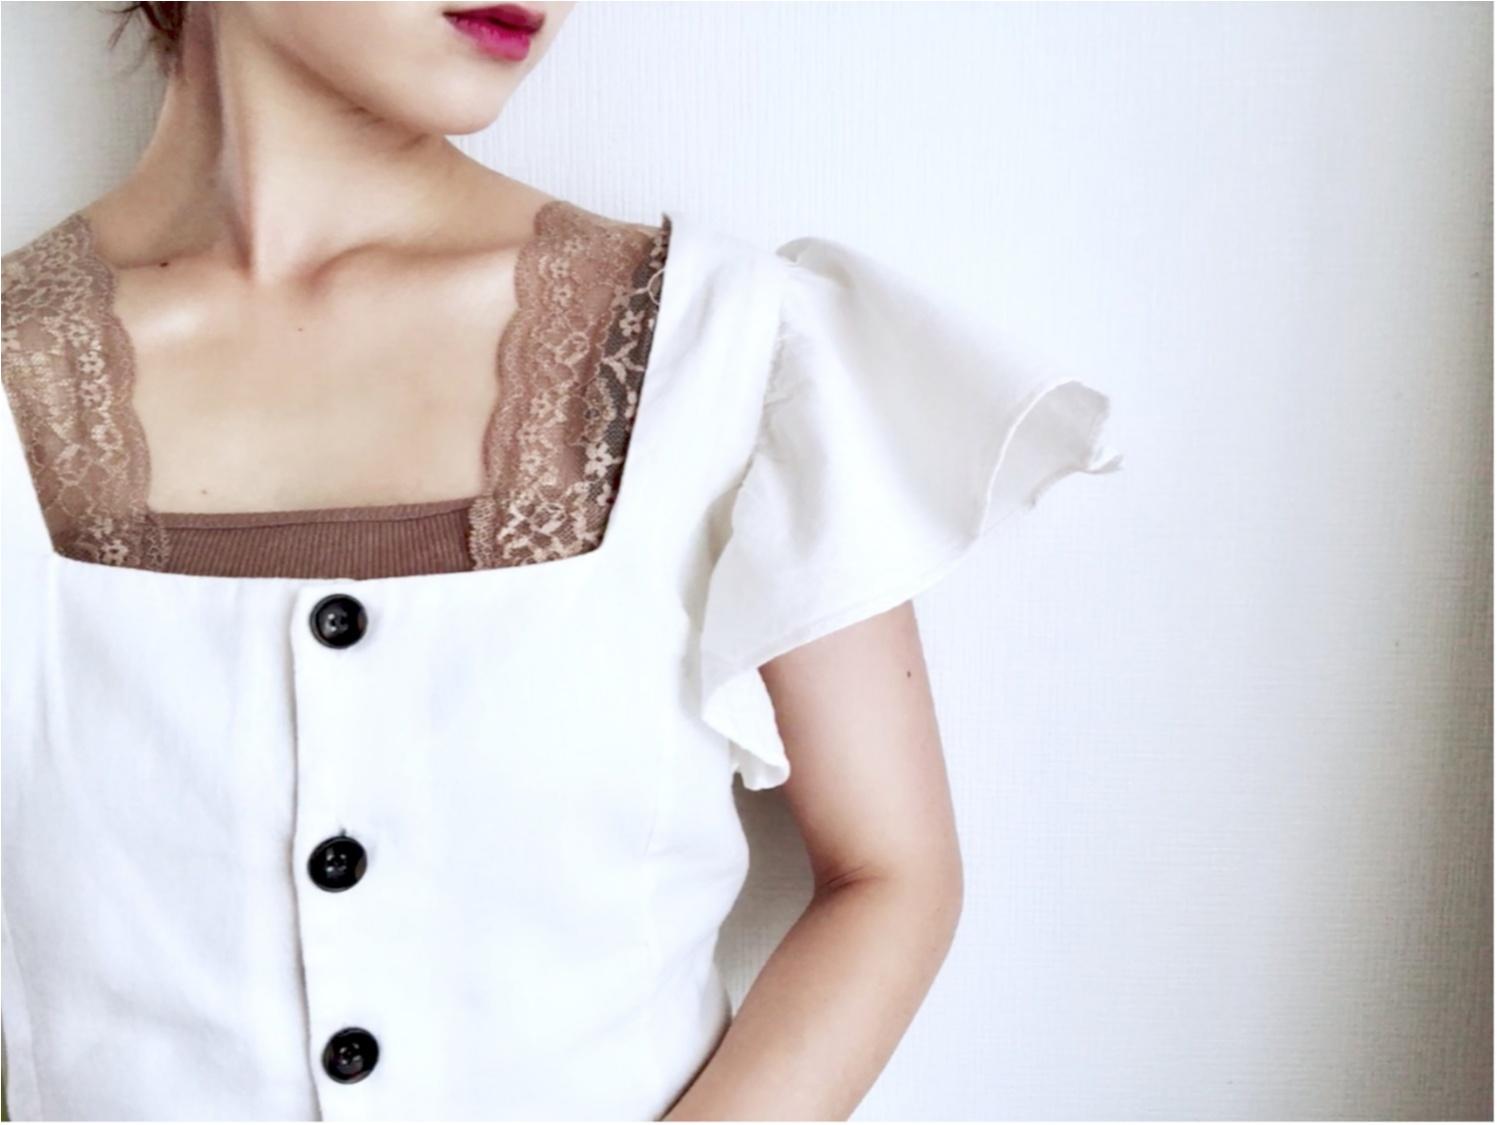 『GU』記事がファッションカテゴリTOP3を独占★ 【今週のモアハピ部人気ランキング】_3